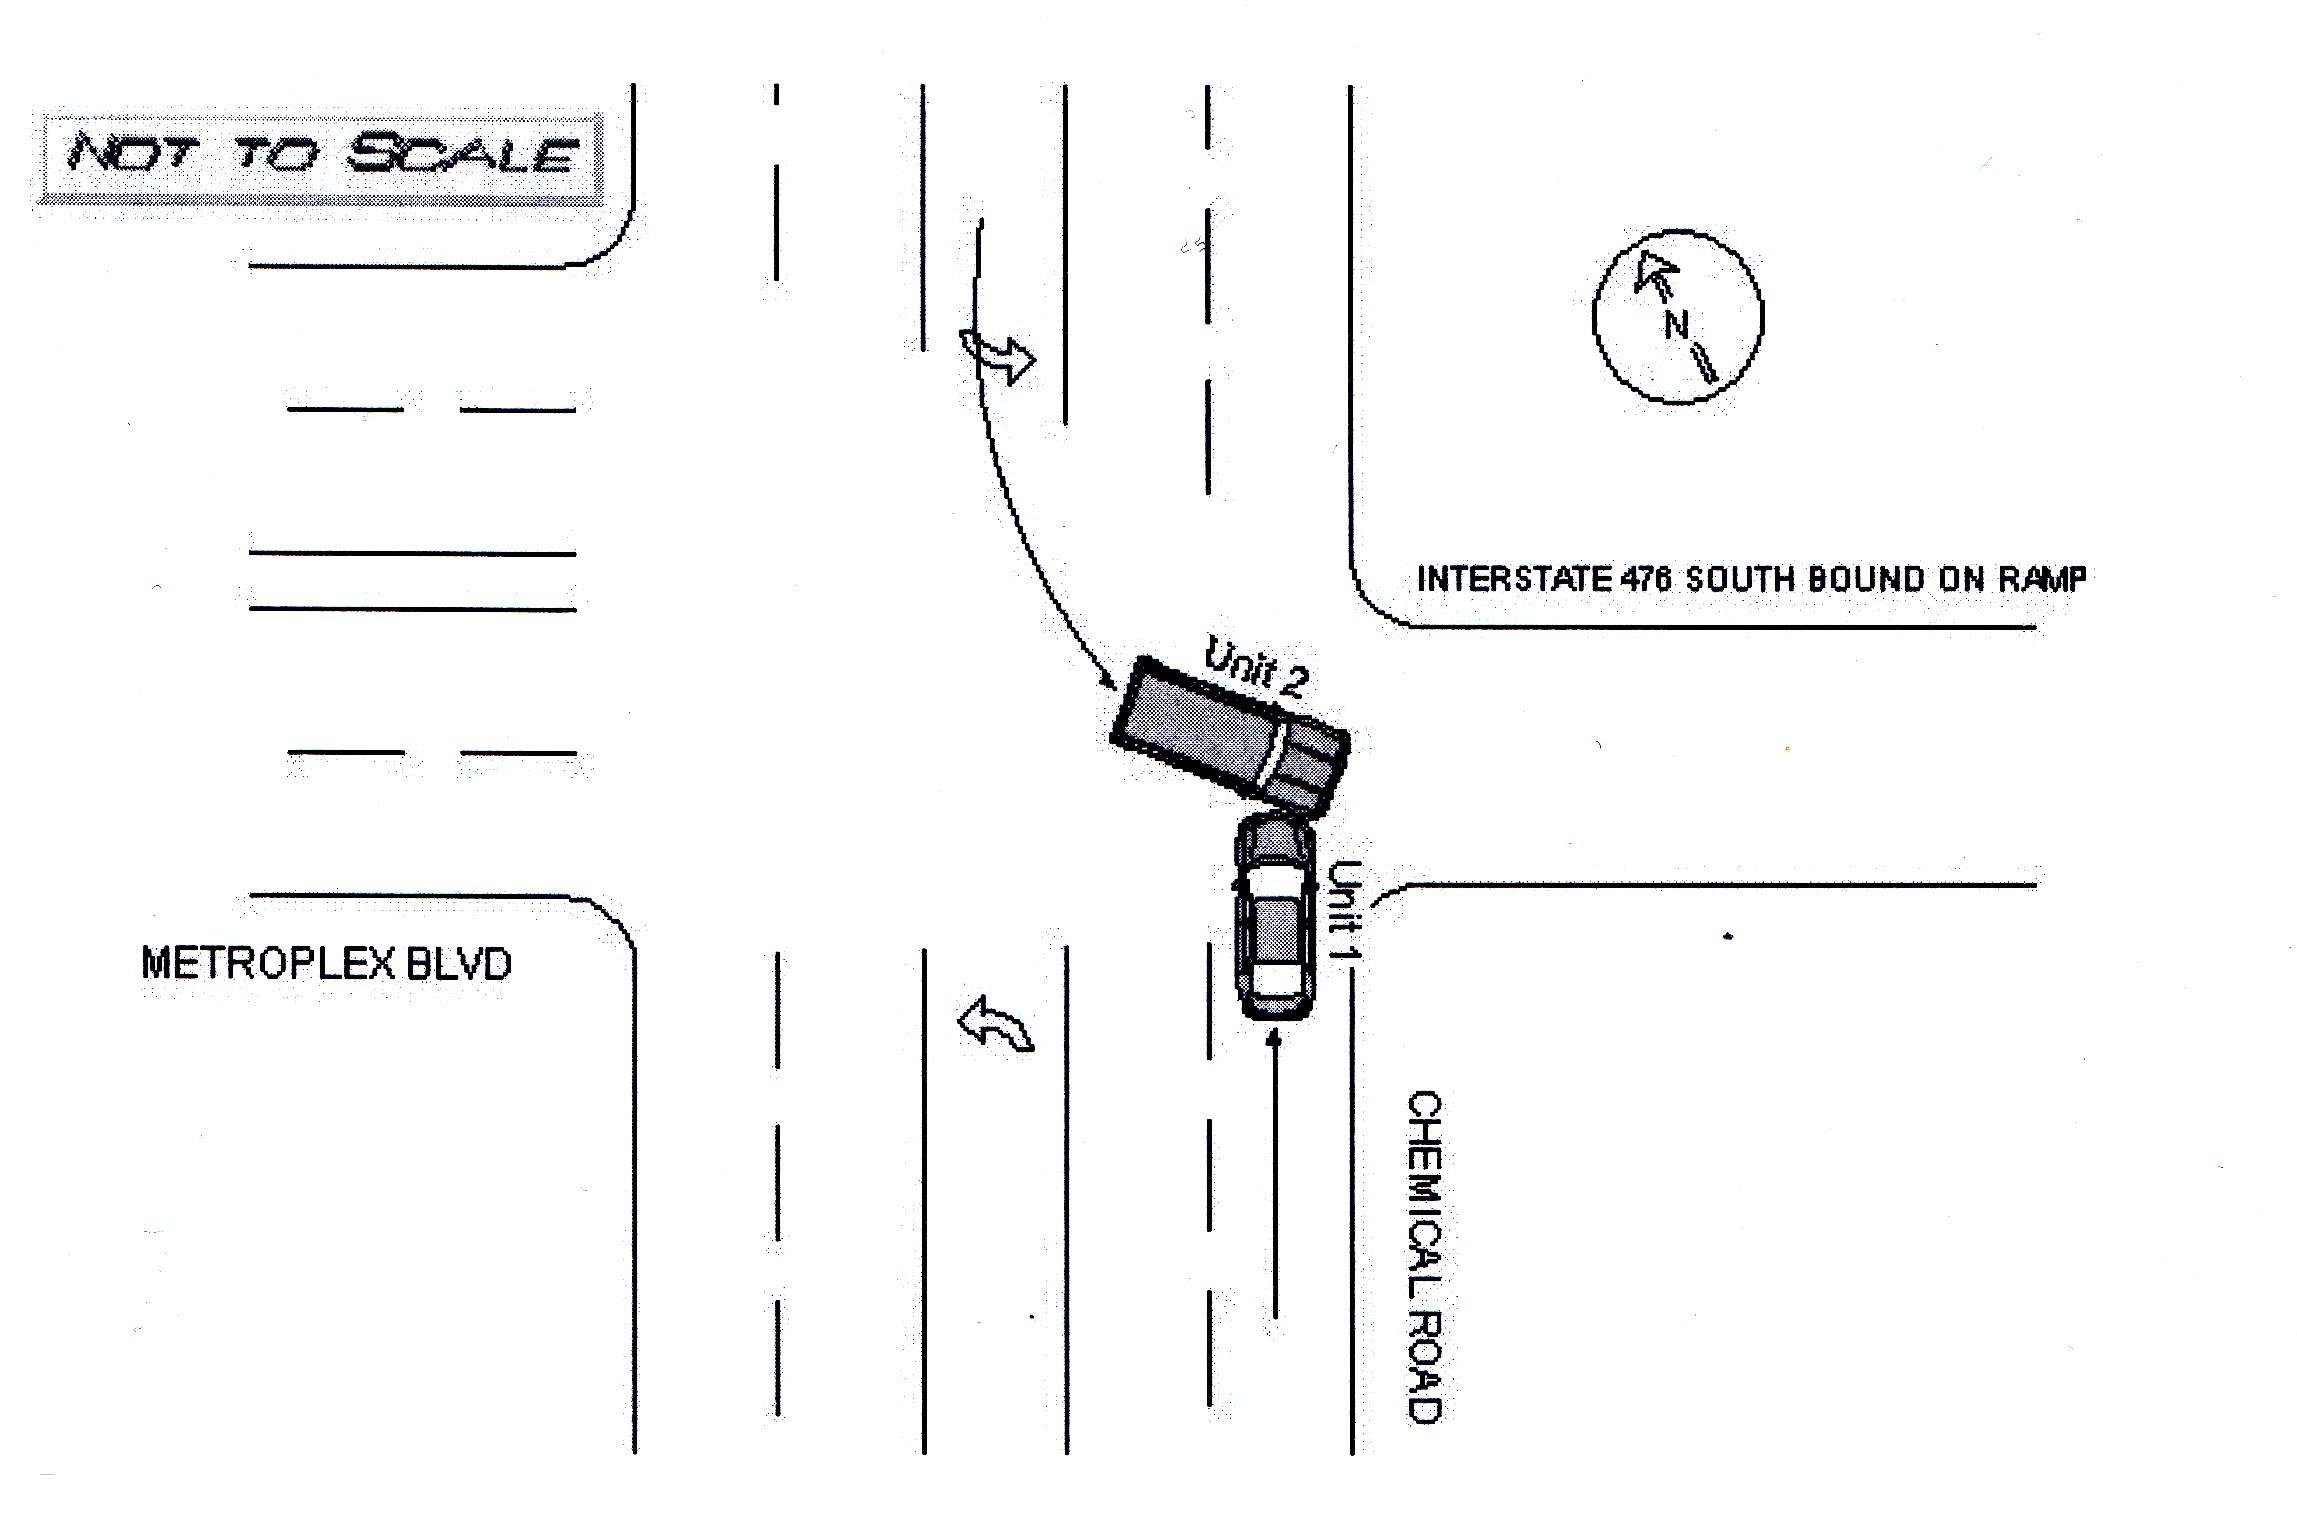 Truck Damage Diagram Vehicle Damage Diagram Template New Charming Accident Scene Diagram Of Truck Damage Diagram